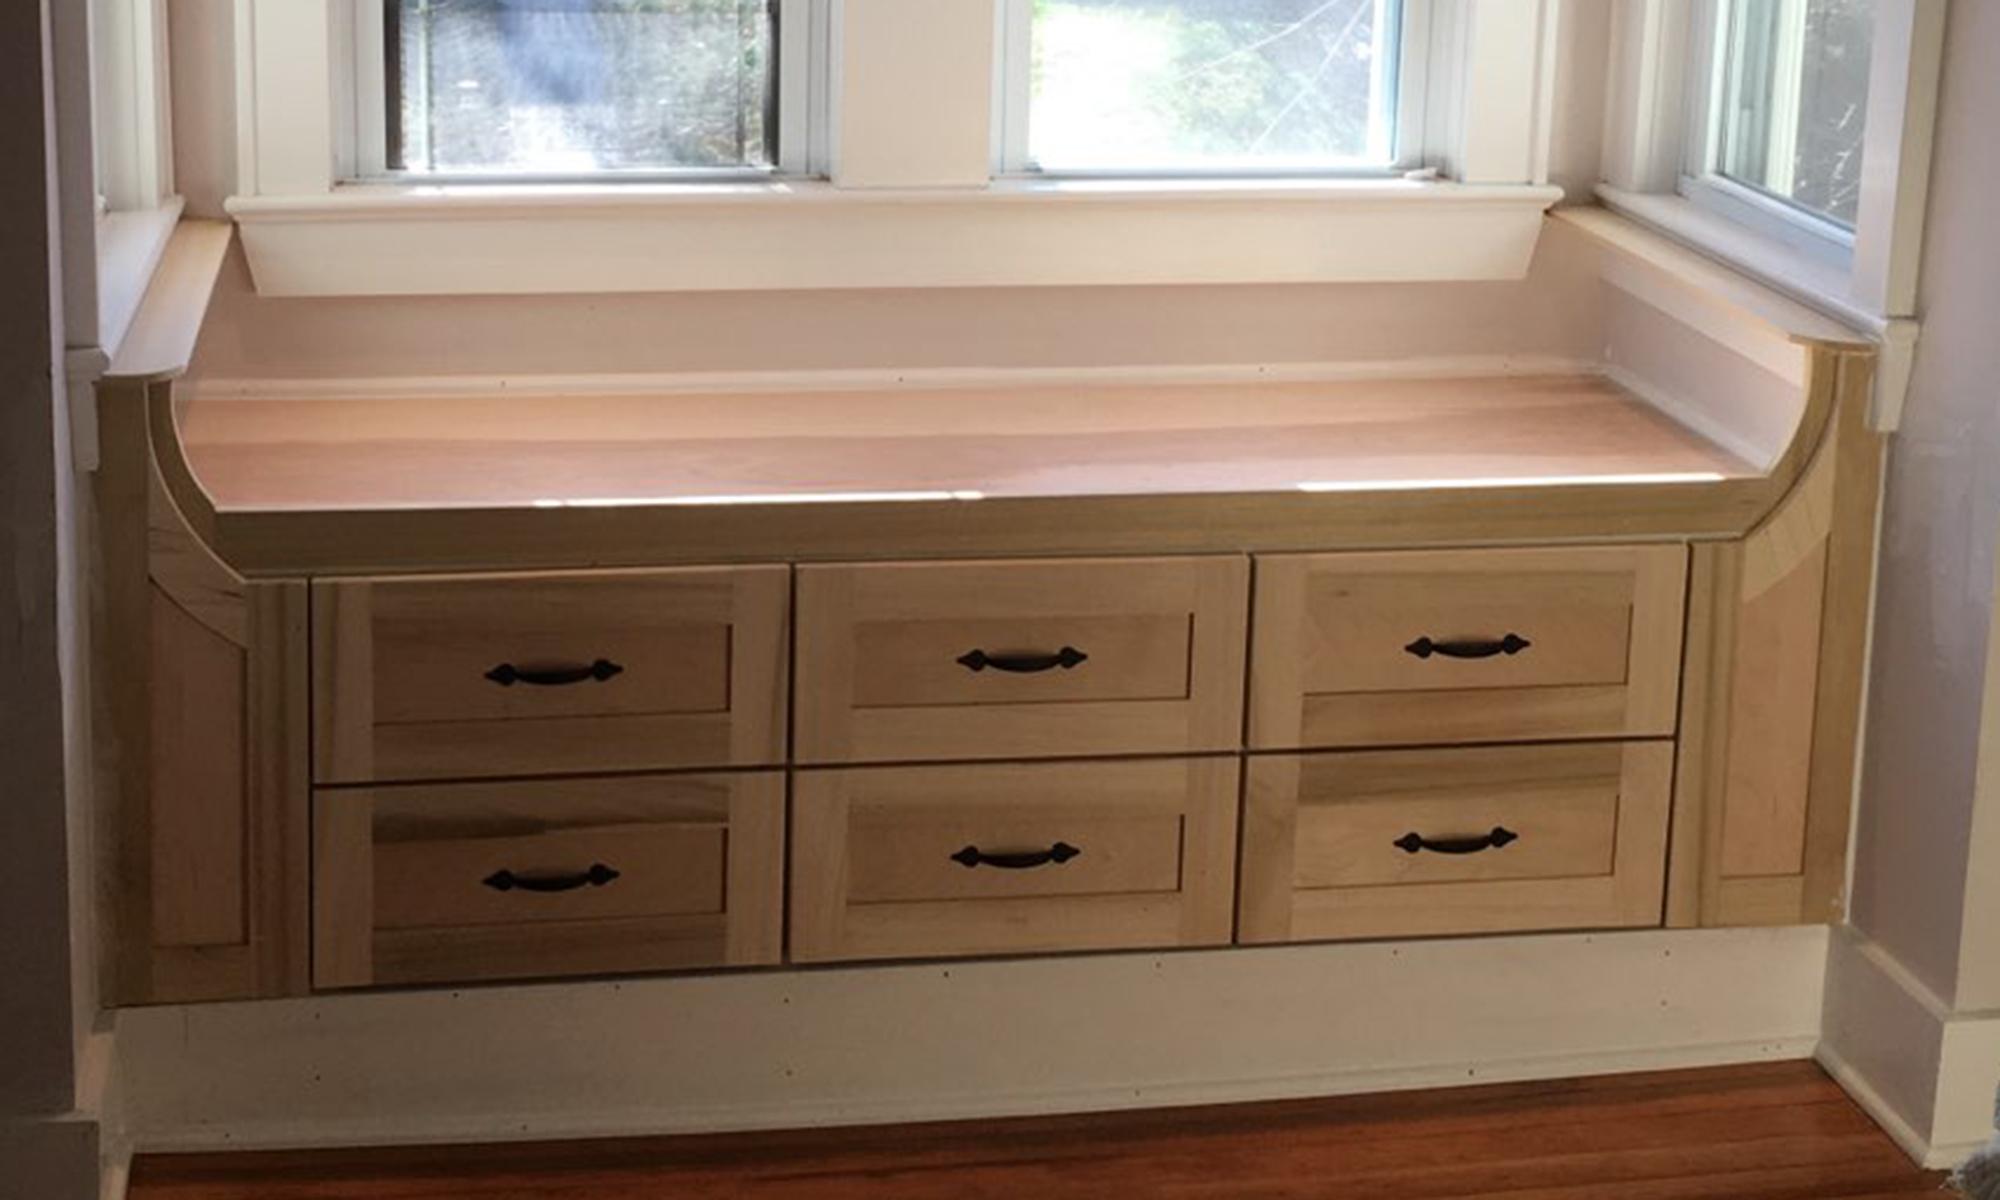 Custom Built-Ins, Cabinets, Gary Hecht Woodworker